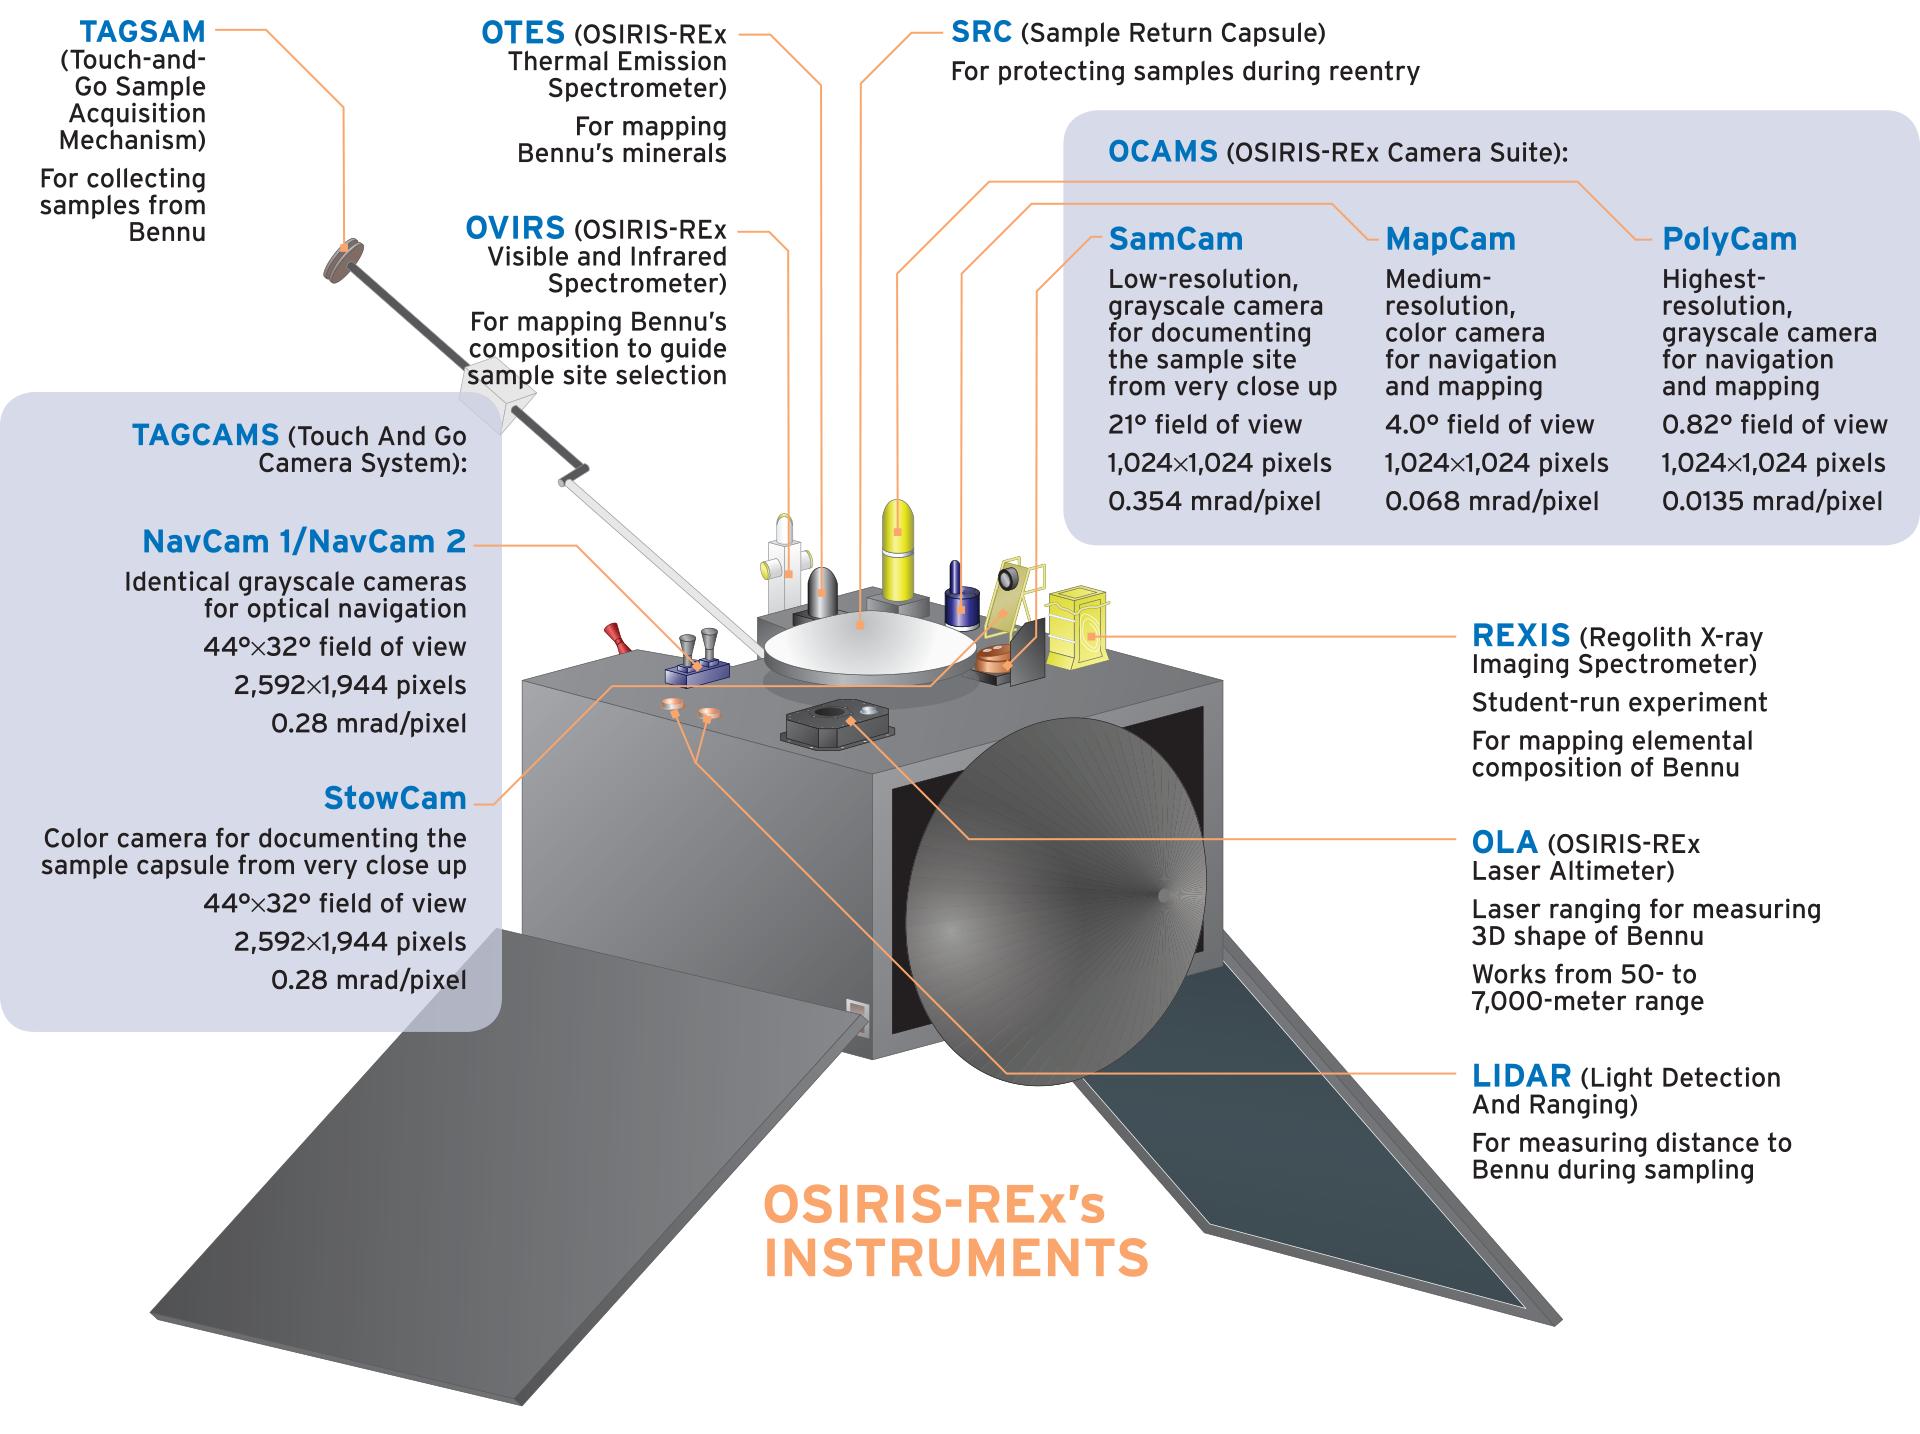 osiris rex s instruments the planetary society